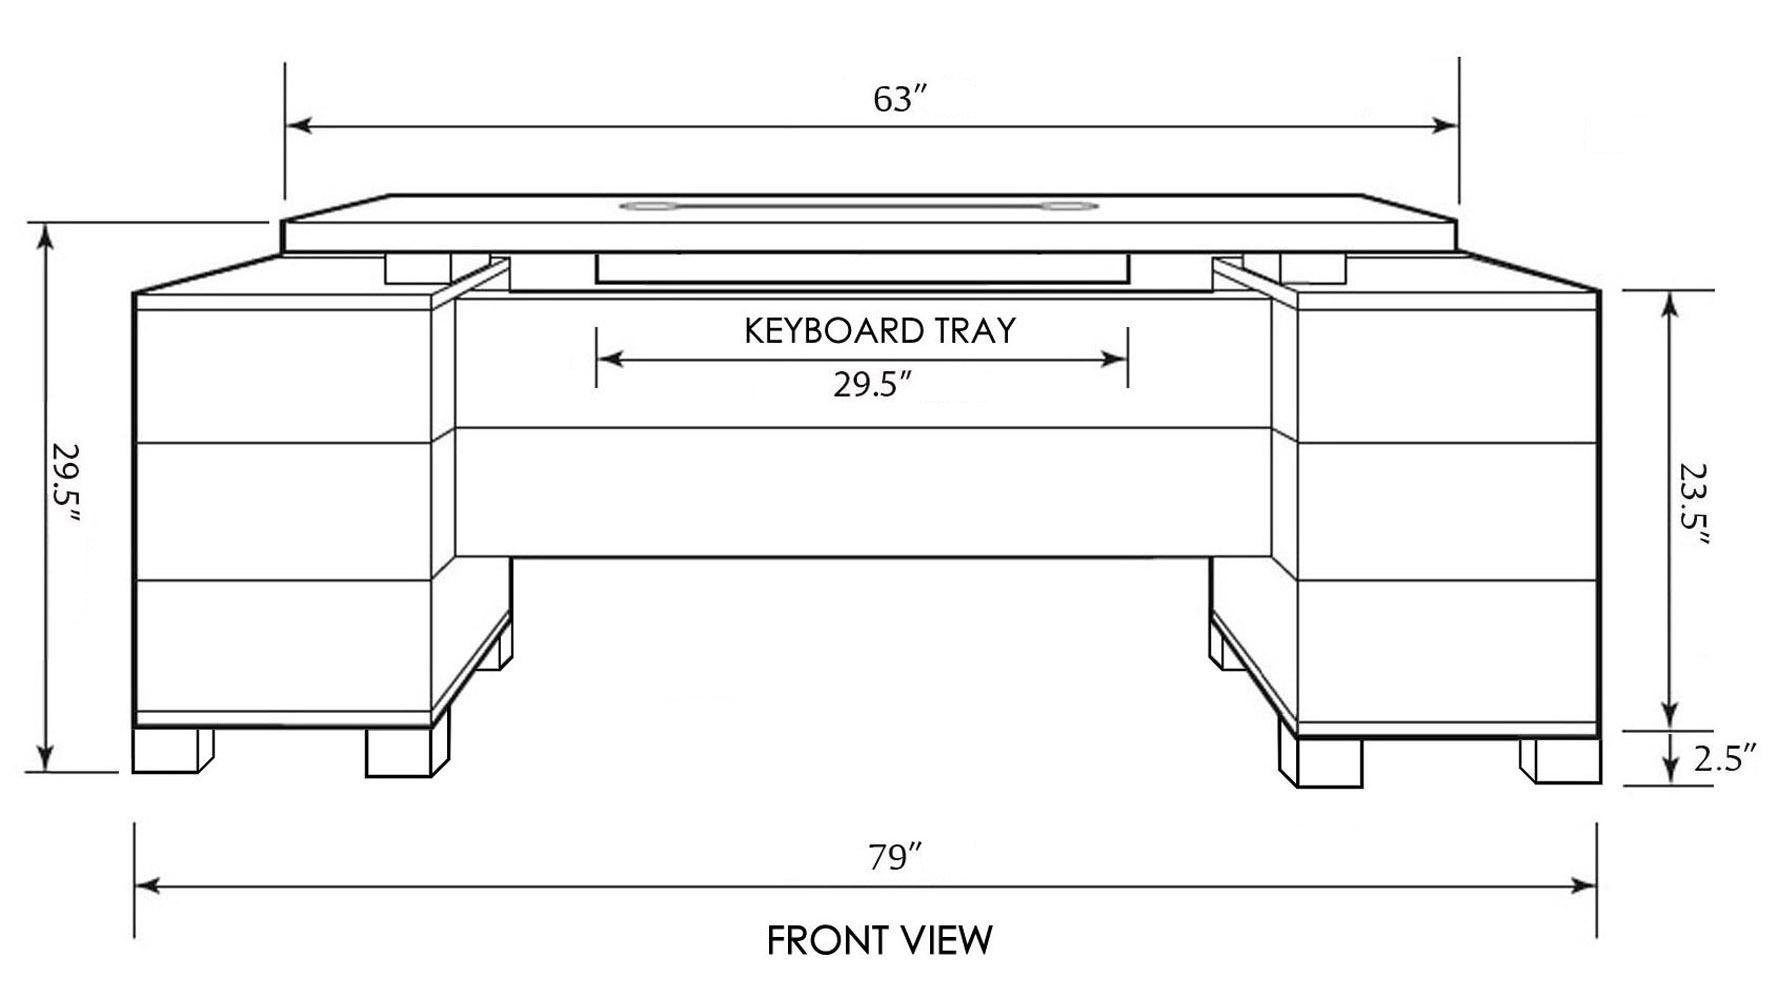 Ford Desk Desk Design Ideas